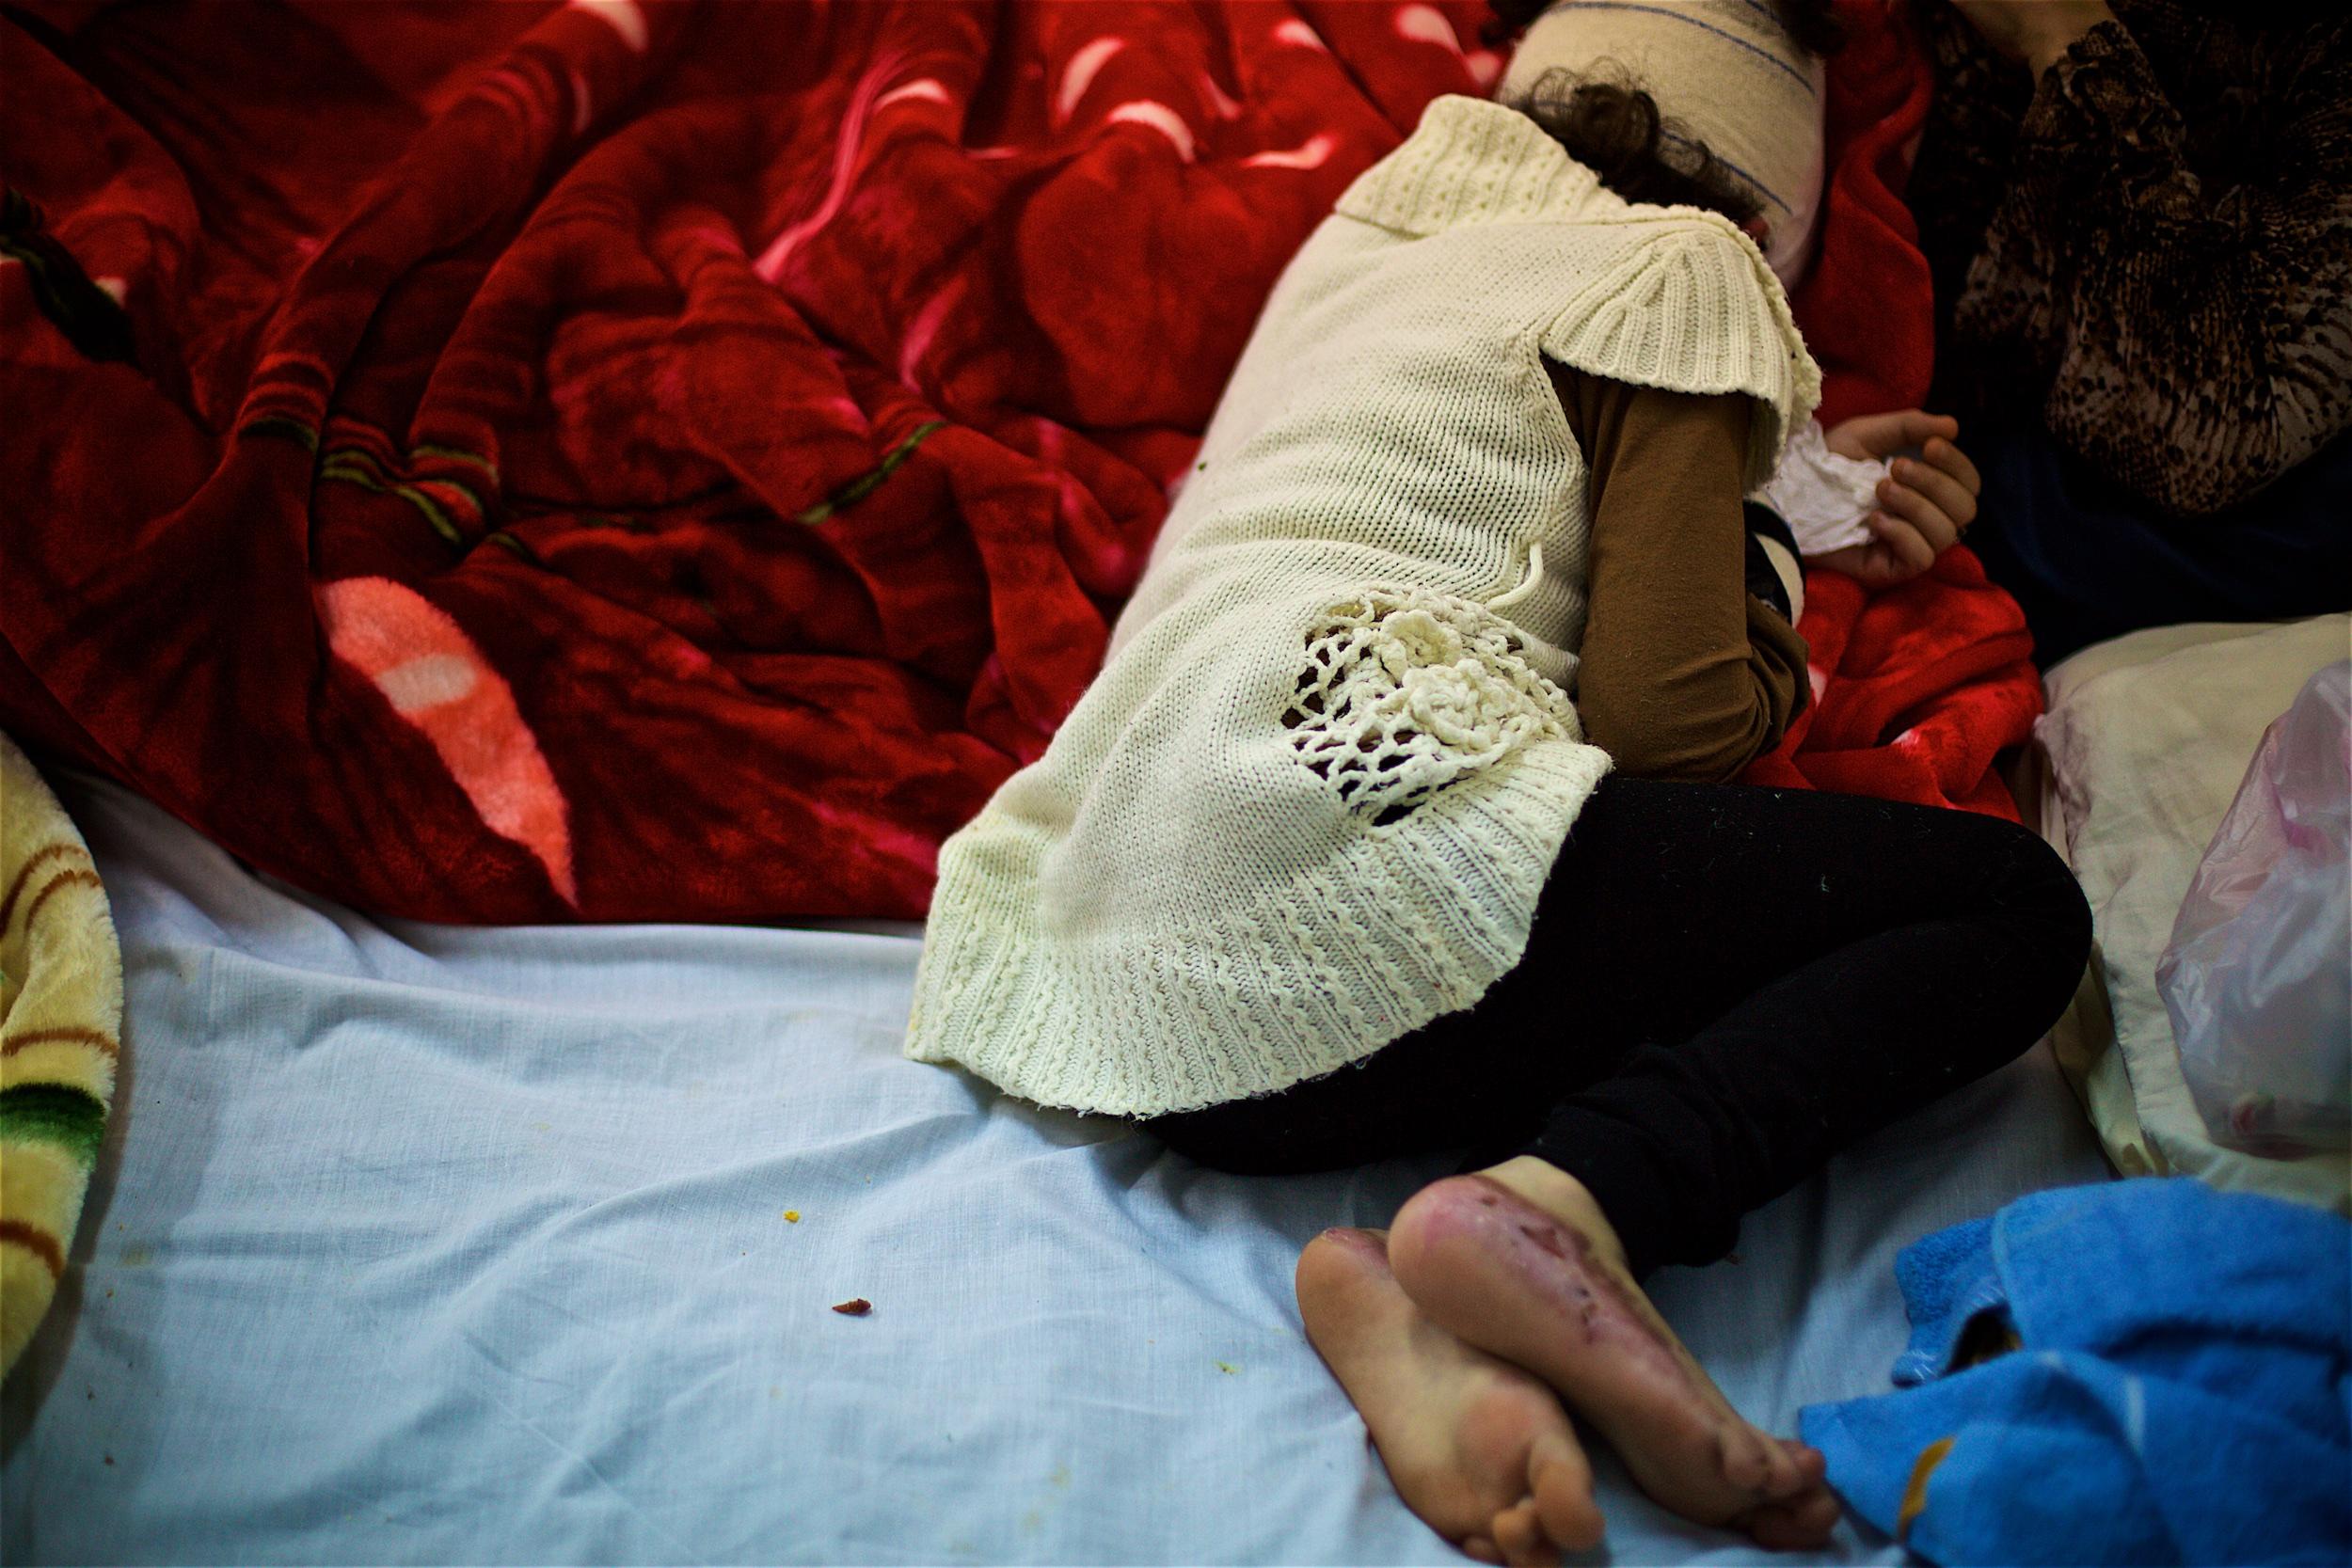 jordan-msf-al-ramtha-dectors-without-borders-war-hospital-refugee-camp-denis-bosnic-37.jpg